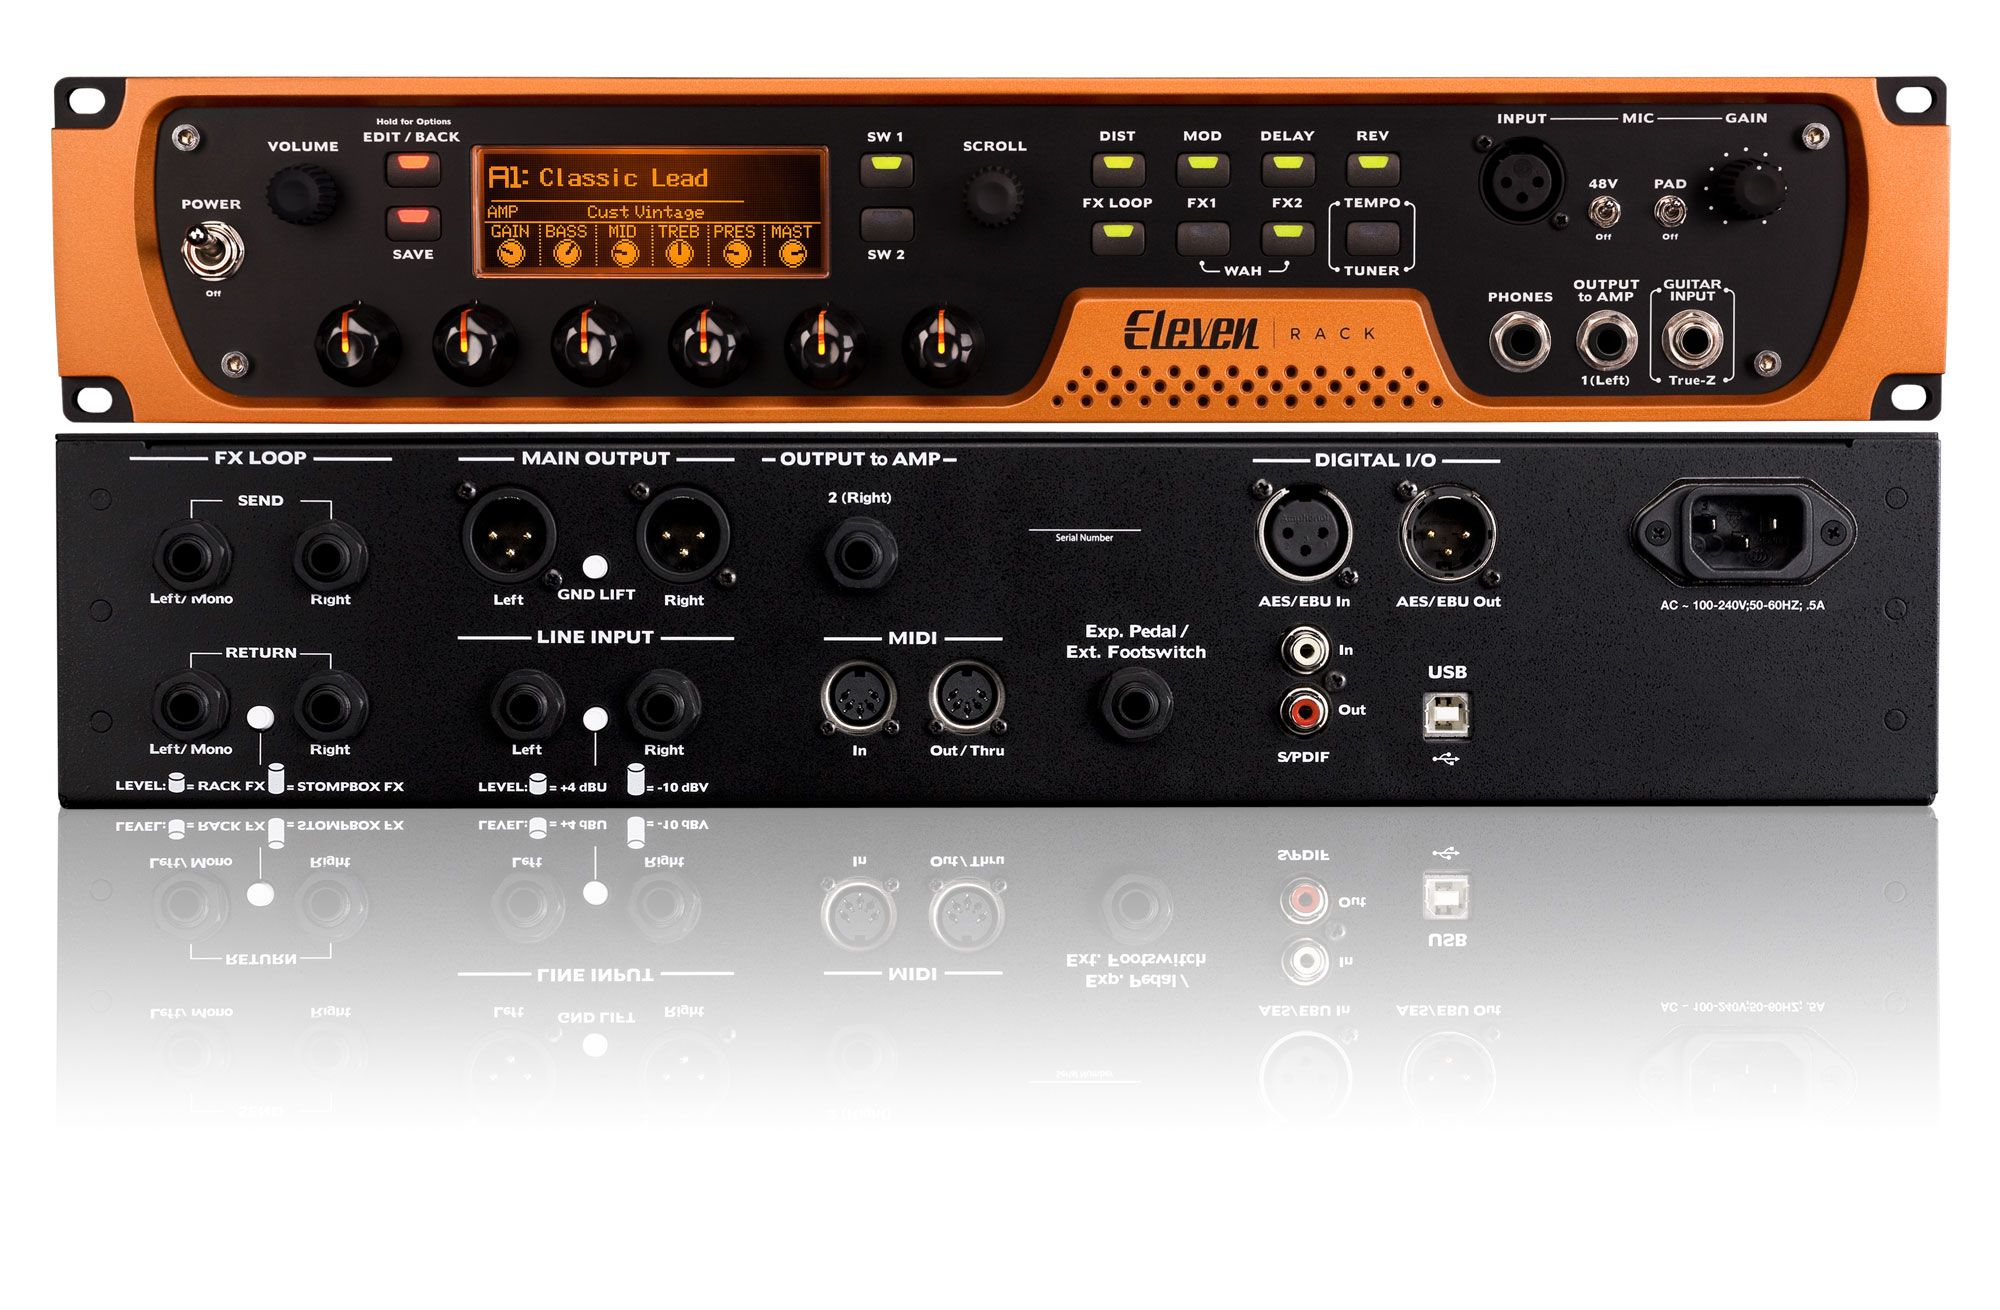 Guitar Preamp Fx Avid Eleven Rack Live Studio Recording Interface